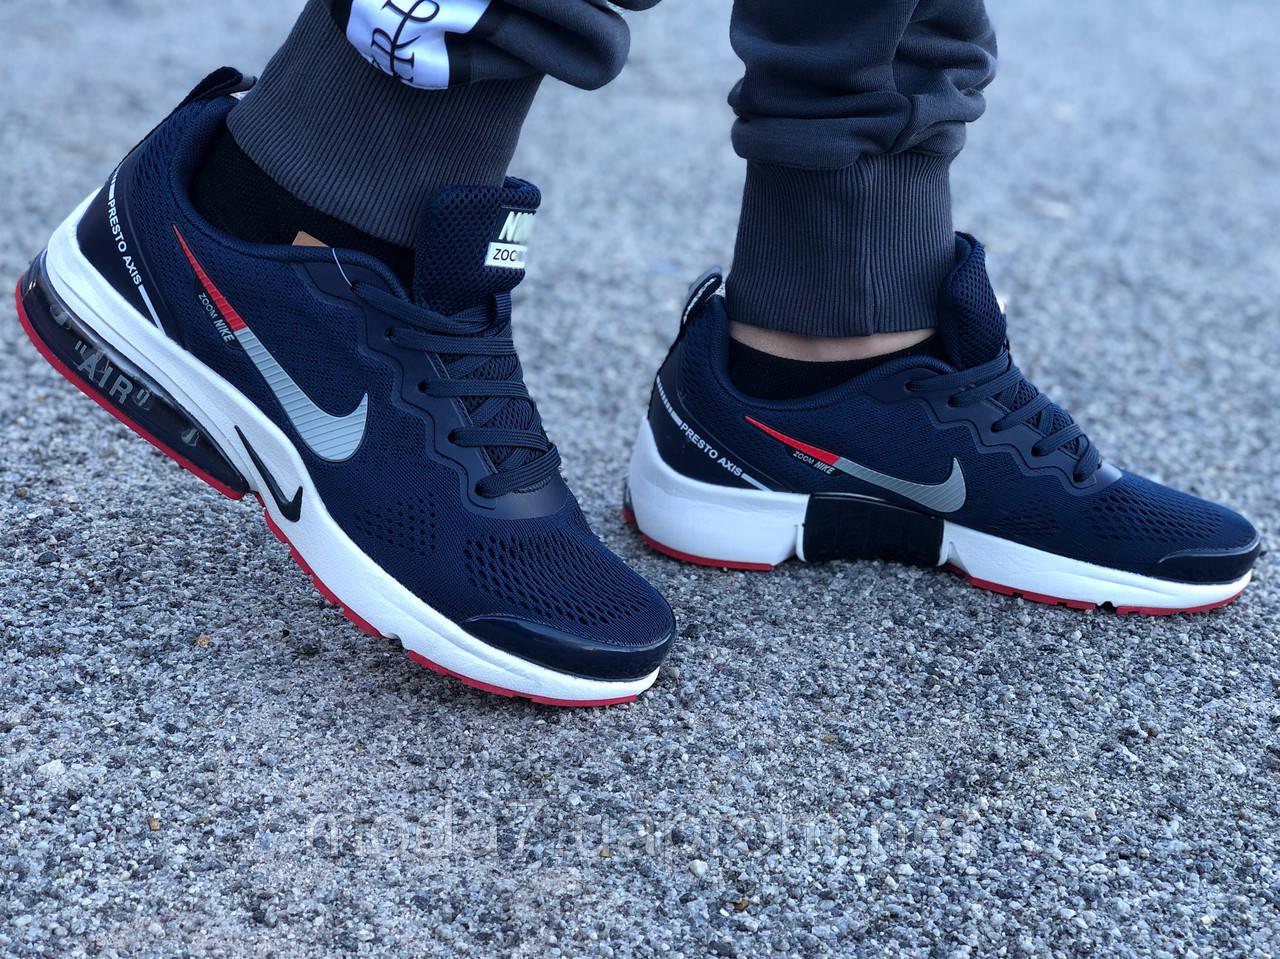 Кроссовки мужские синие Nike Air Presto Axis реплика